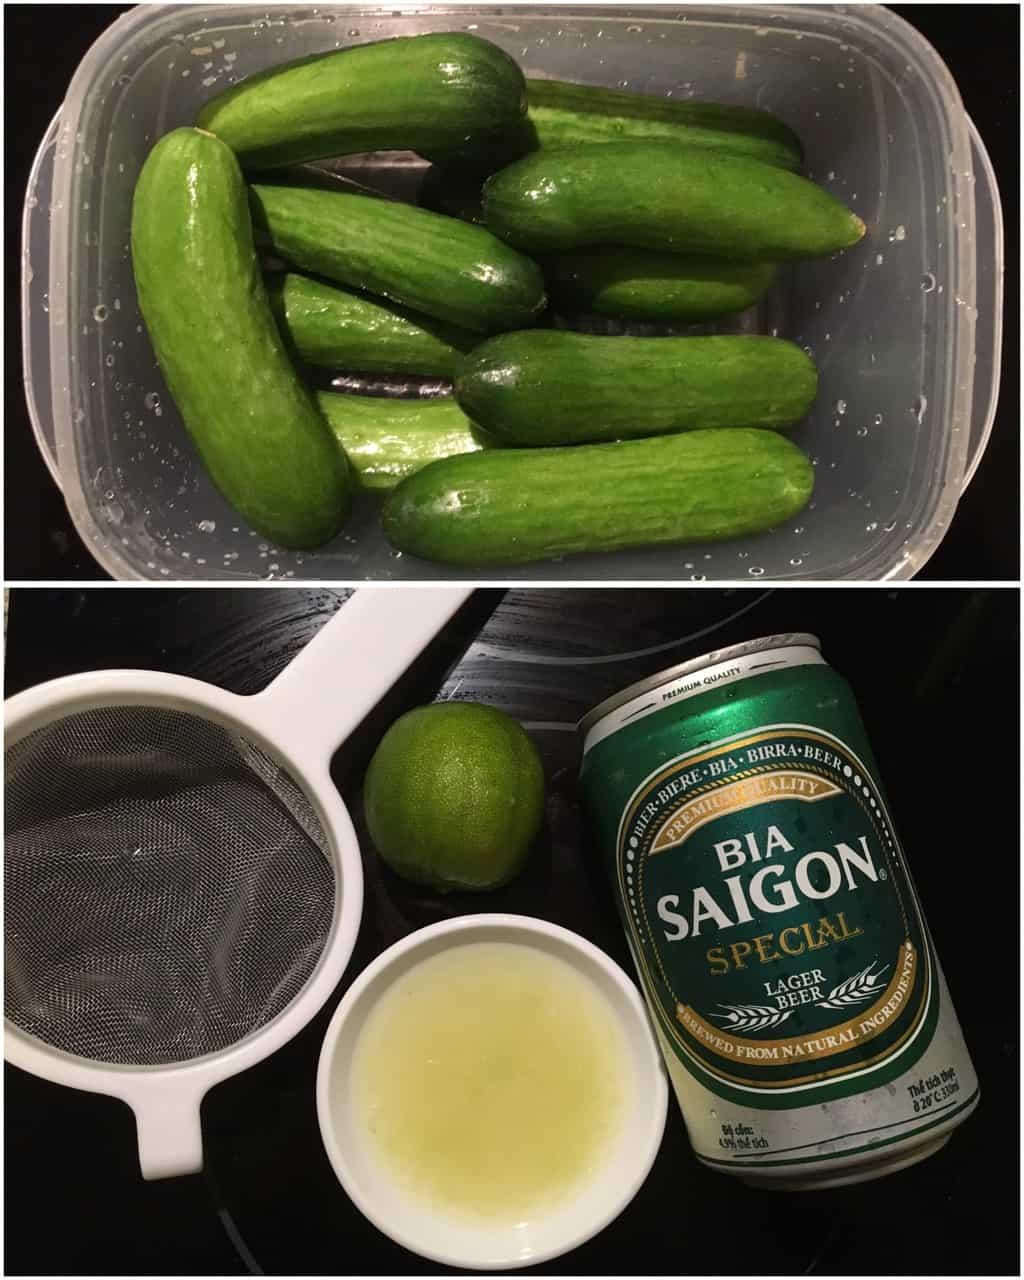 cach-lam-se-khit-lo-chan-long-bang-bia-dua-chuot